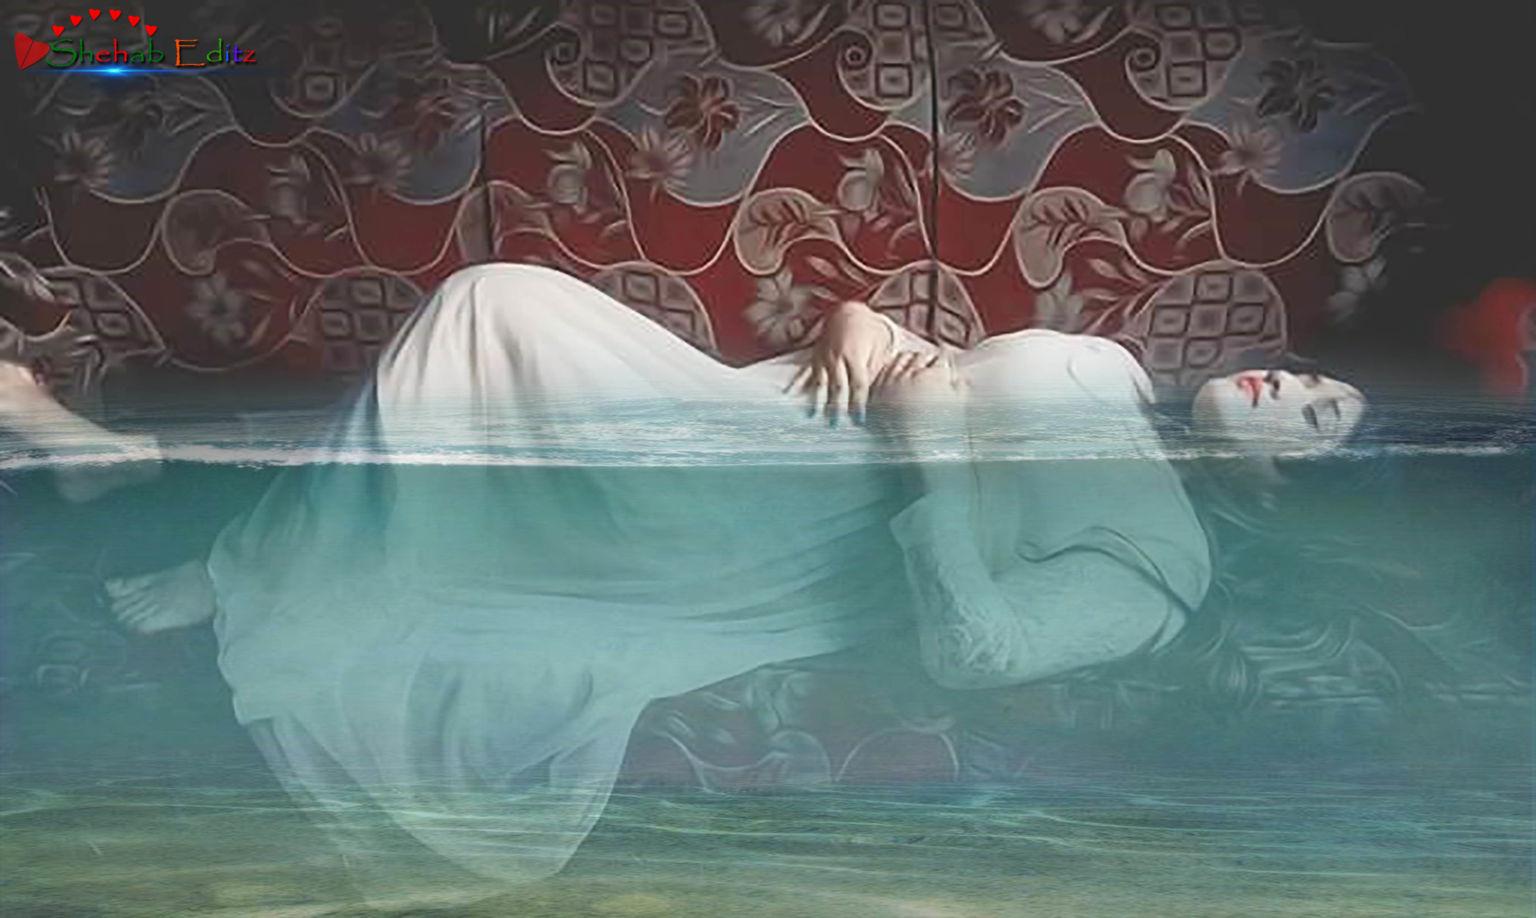 Under Water Photo Manipulation   আপনার ছবিকে পানির নিচে ডুবিয়ে দিন ফটোশপের মাধ্যমে..